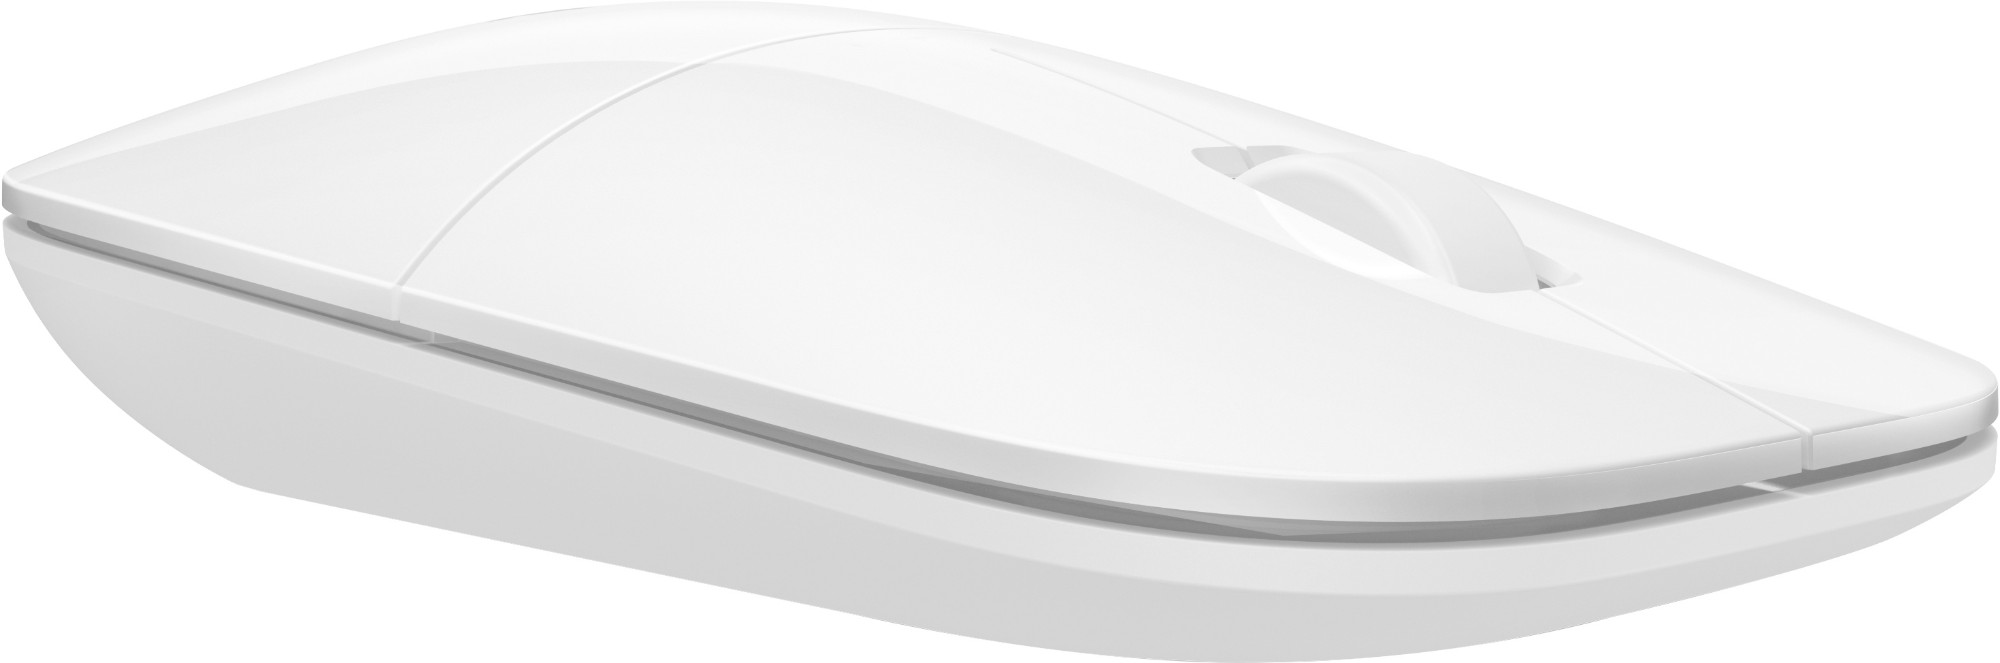 HP Z3700 White Wireless mouse Ambidextrous RF Wireless Optical 1200 DPI